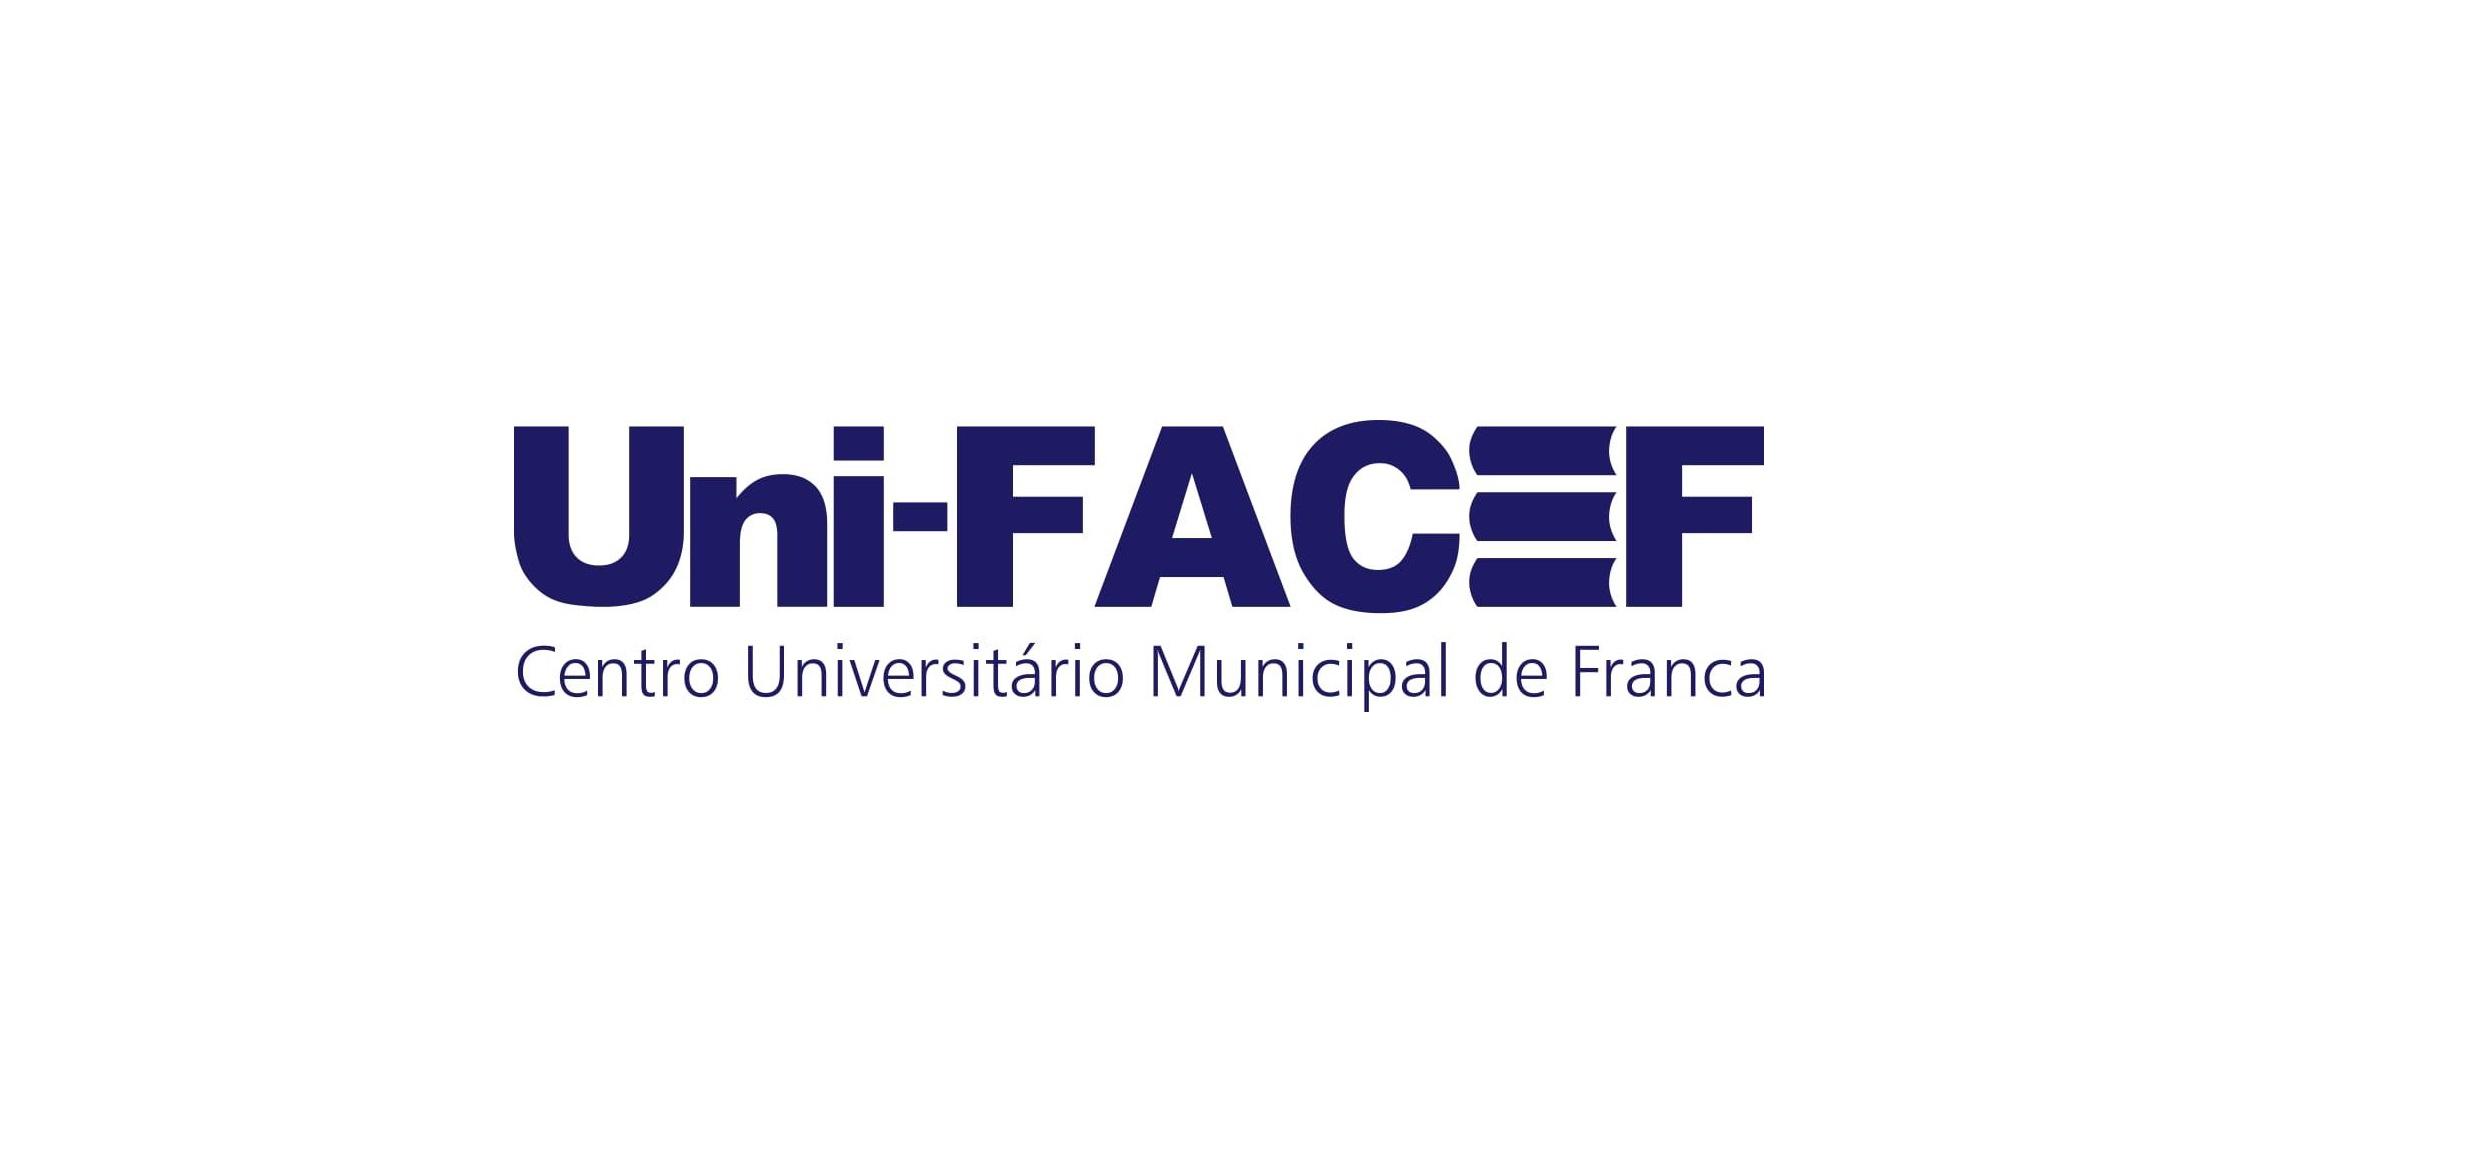 UNIFACEF